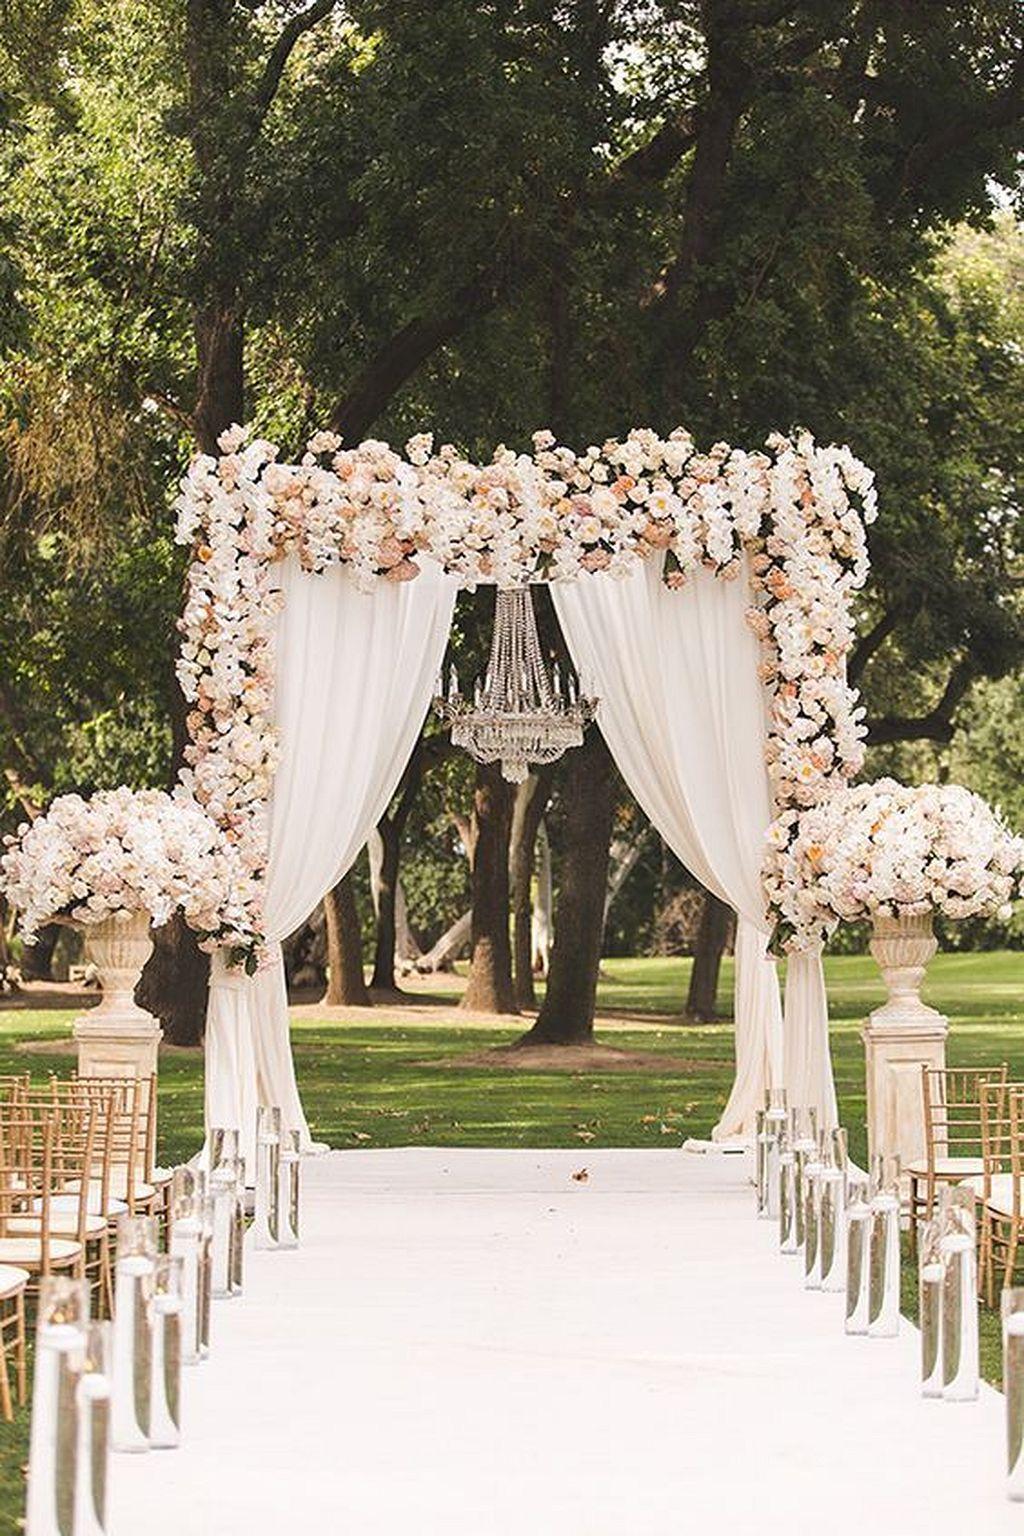 70 beautiful floral wedding altar ideas pinterest wedding cool 70 beautiful floral wedding altar ideas httpsweddmagz70 beautiful floral wedding altar ideas junglespirit Gallery